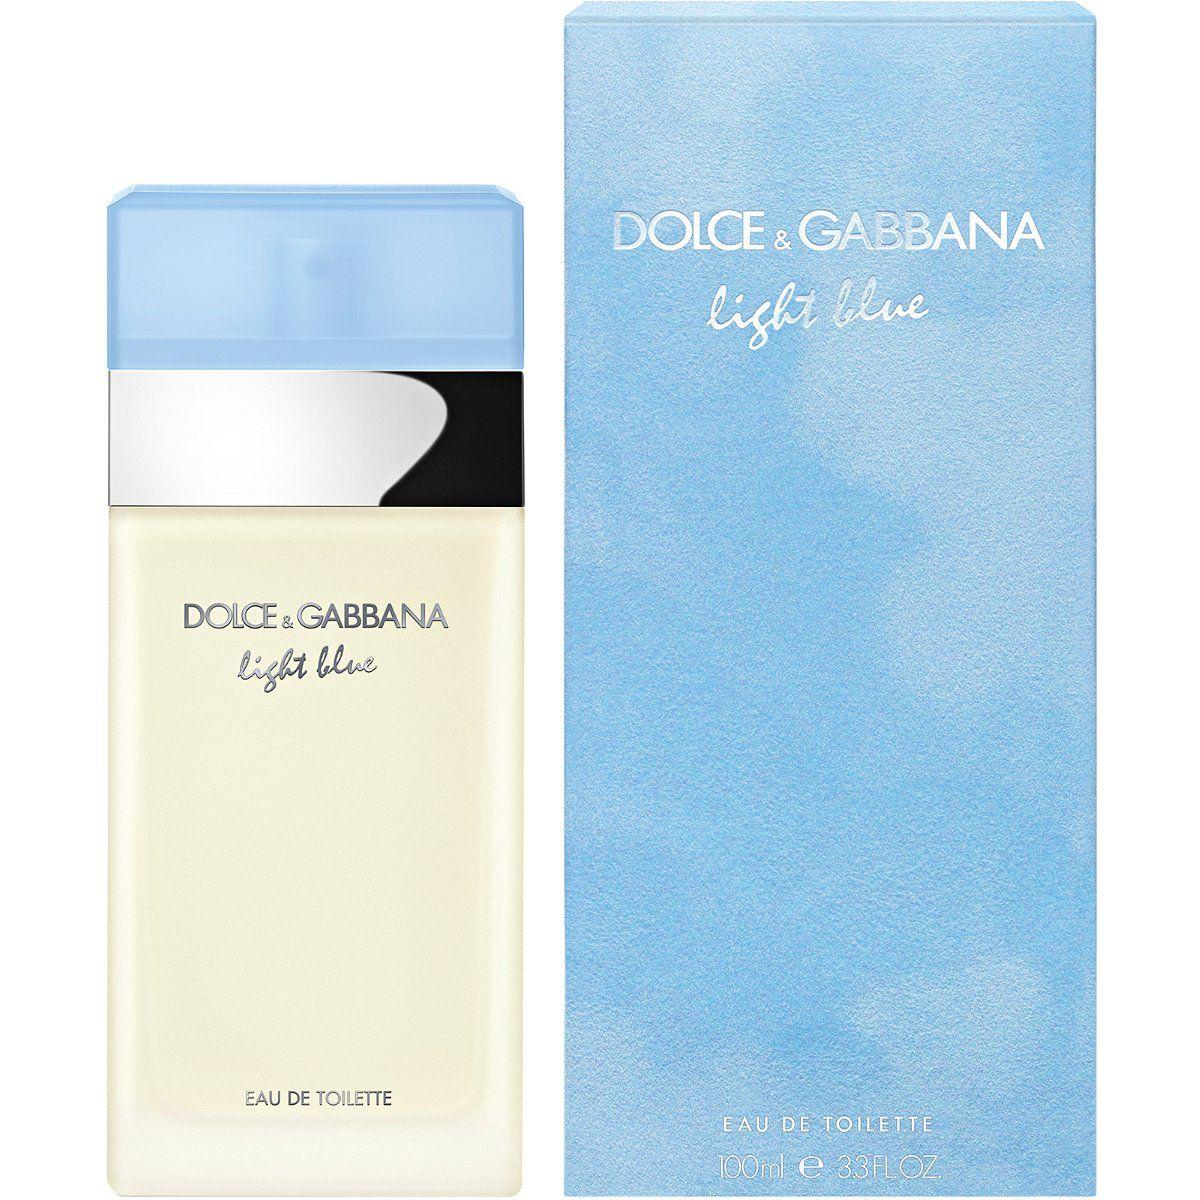 Dolce Gabbana Light Blue Eau De Toilette Ulta Beauty In 2021 Light Blue Perfume Blue Perfume Light Blue Dolce Gabbana